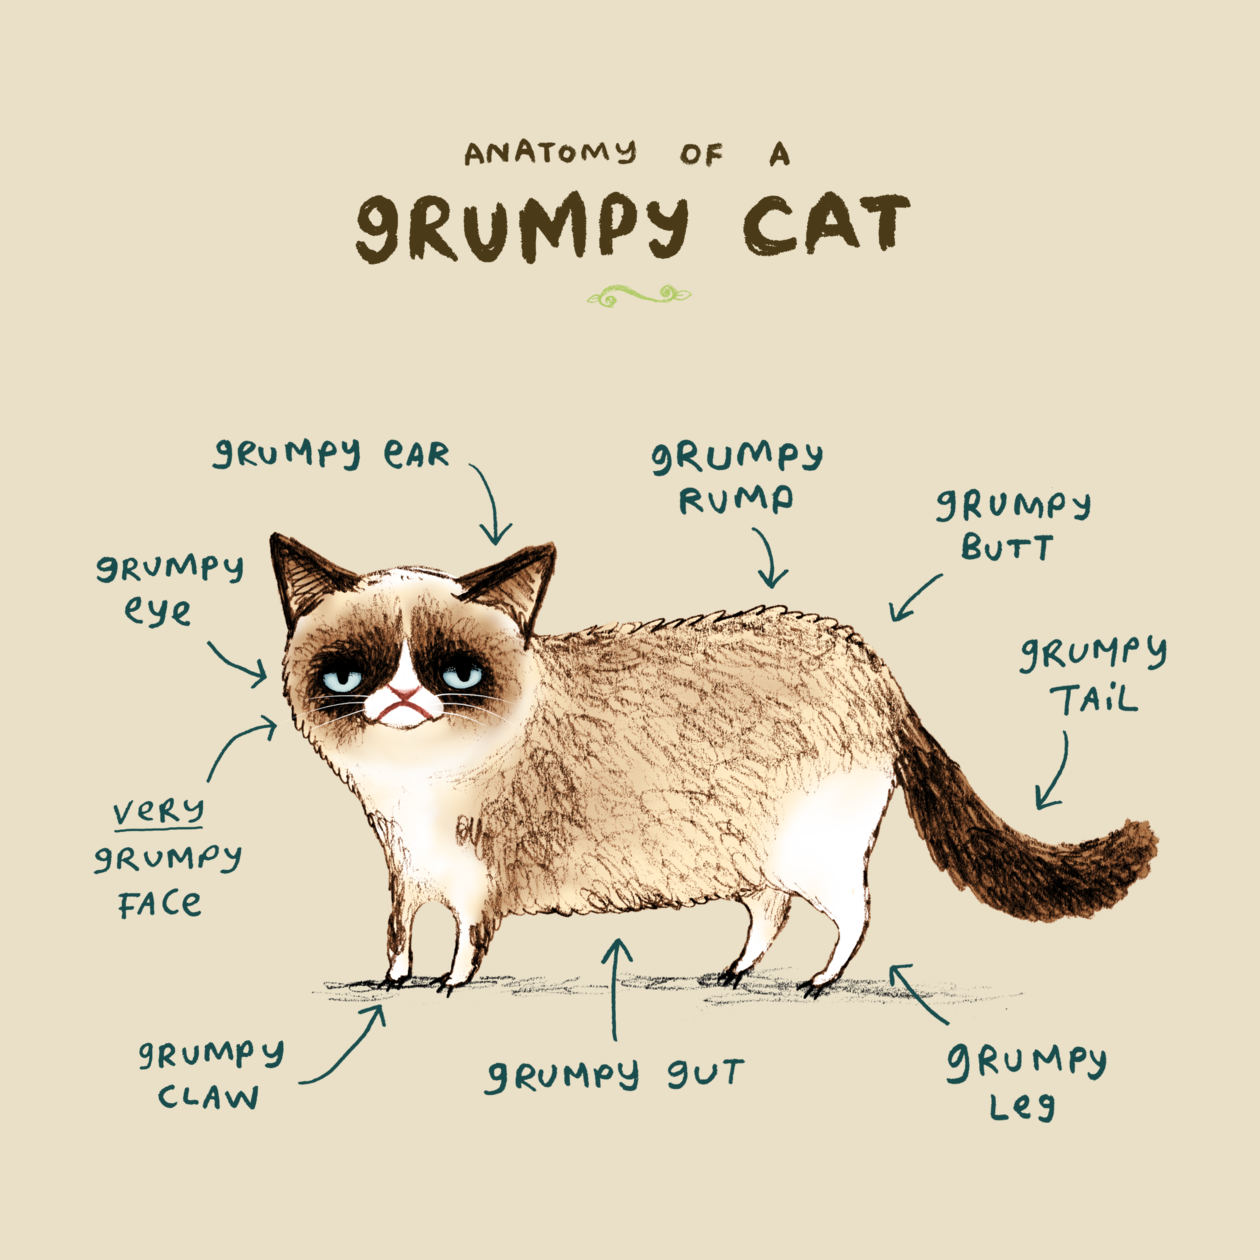 Anatomy+of+a+Grumpy+Cat\' design on TeePublic http://bit.ly/1xhurUN ...